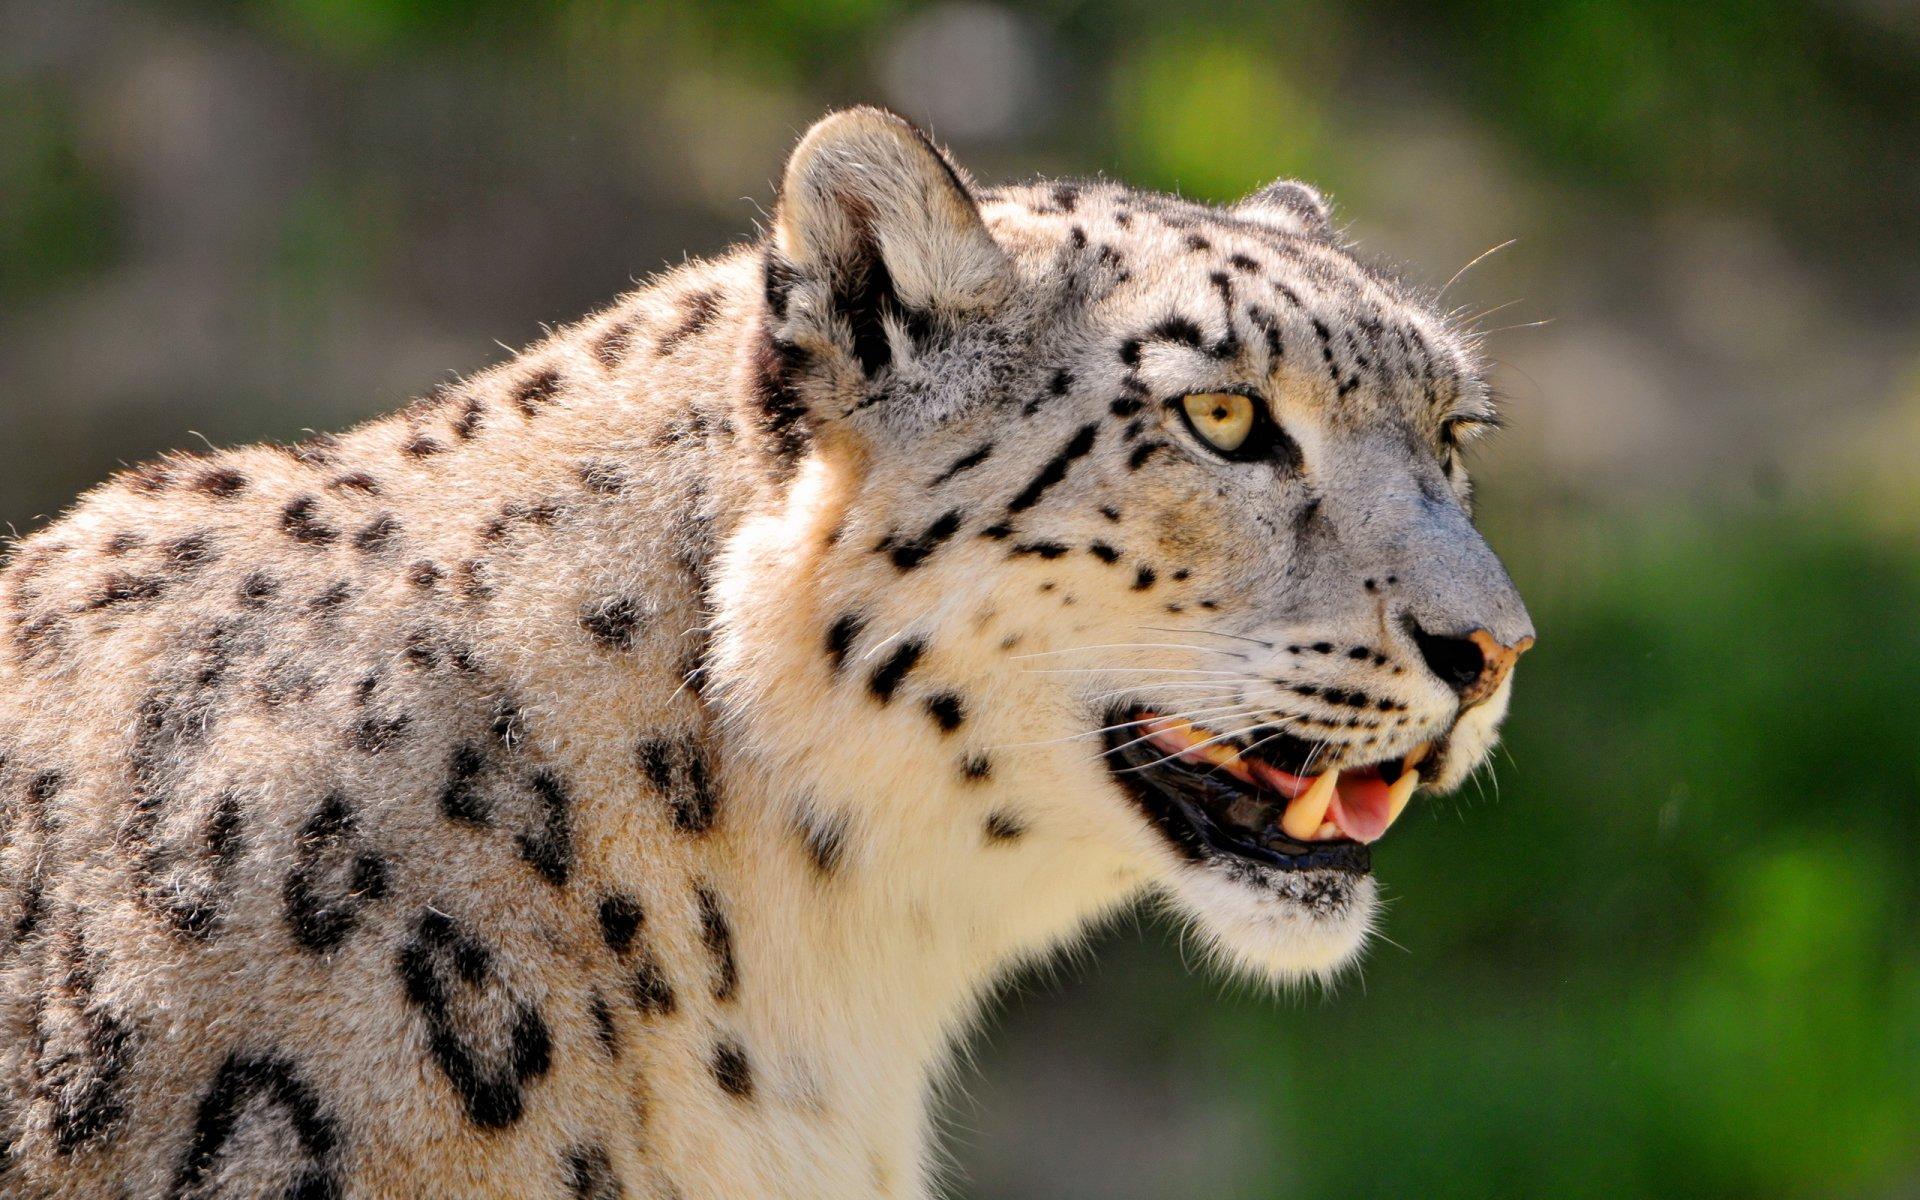 Animales Felino Leopardos Fondo De Pantalla Fondos De: Leopardo De Las Nieves Full HD Fondo De Pantalla And Fondo